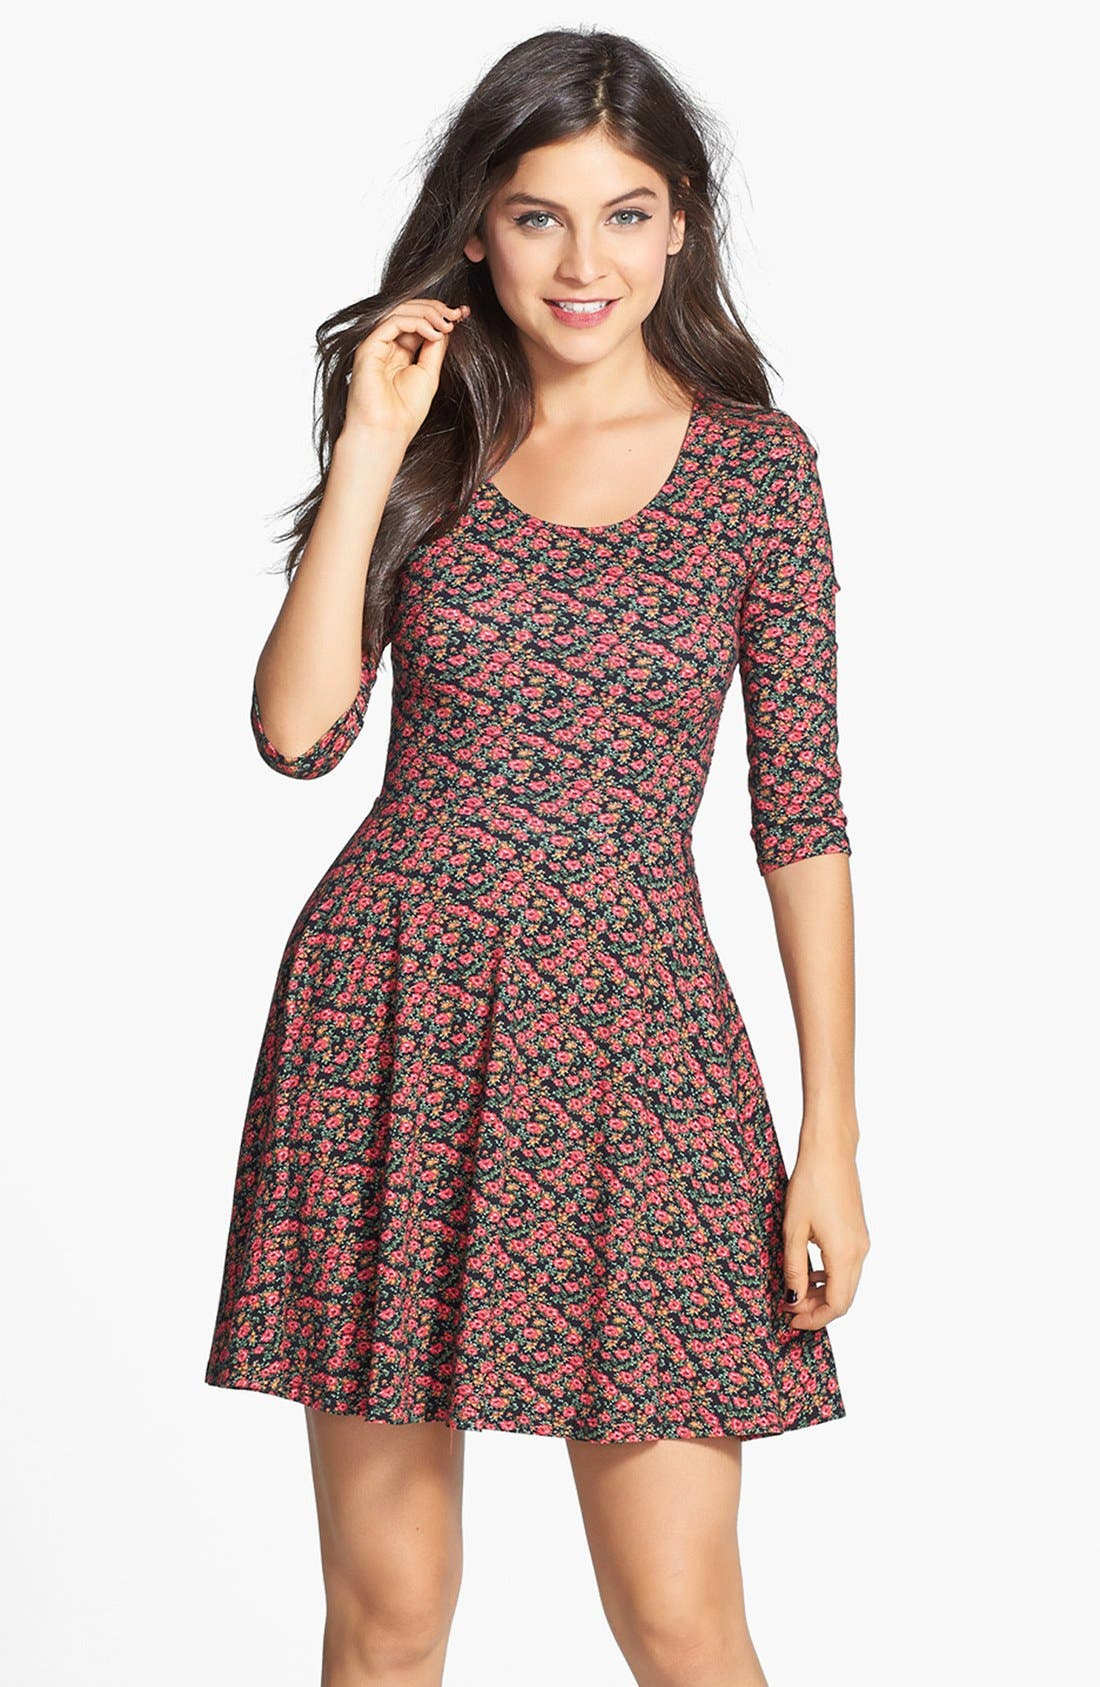 Alternate Image 1 Selected - Lush Floral Print Knit Skater Dress (Juniors)